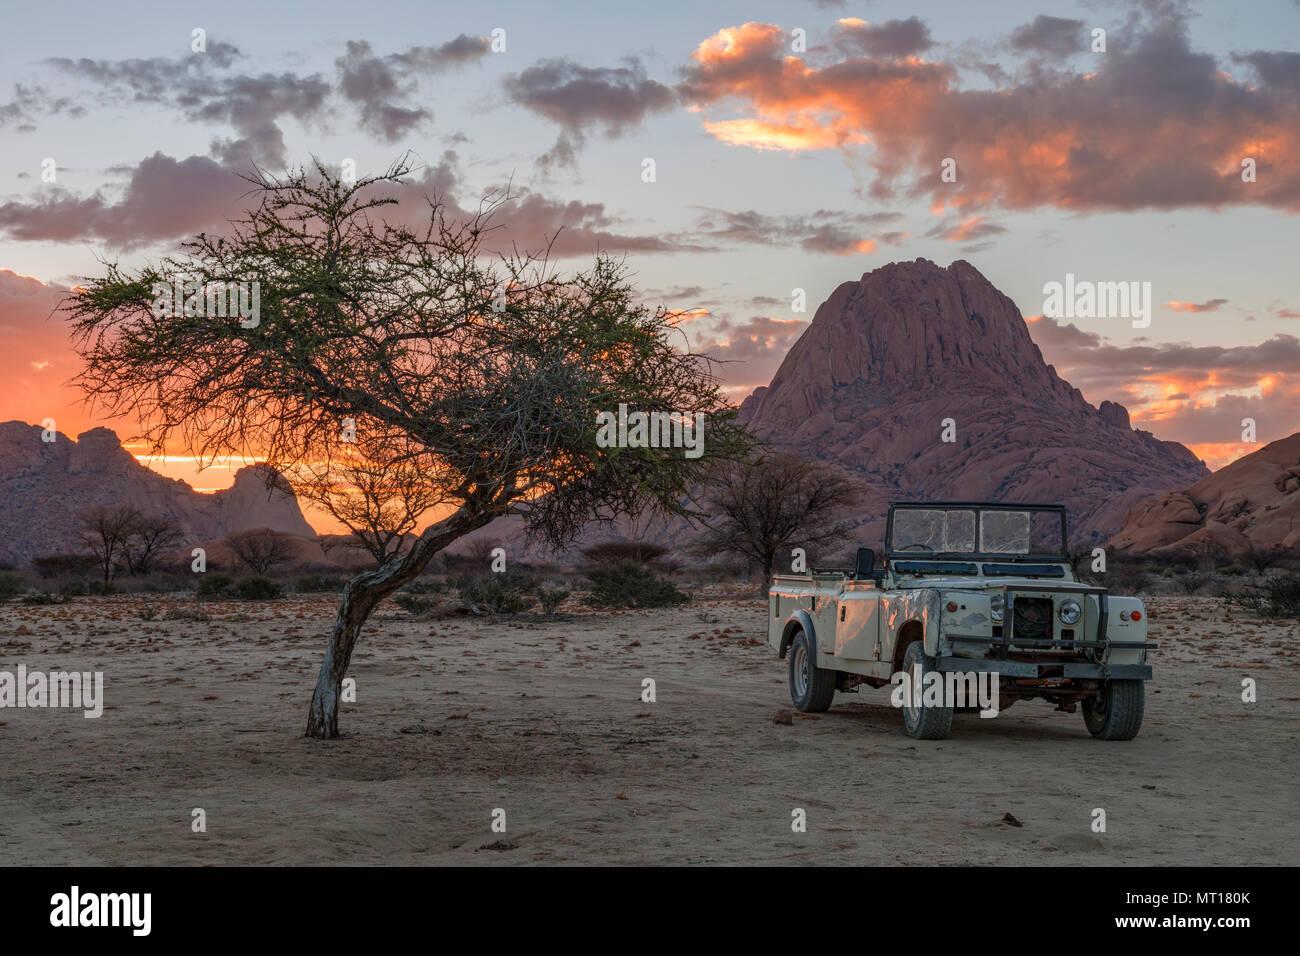 Spitzkoppe, Usakos, Namibia, Africa - Stock Image